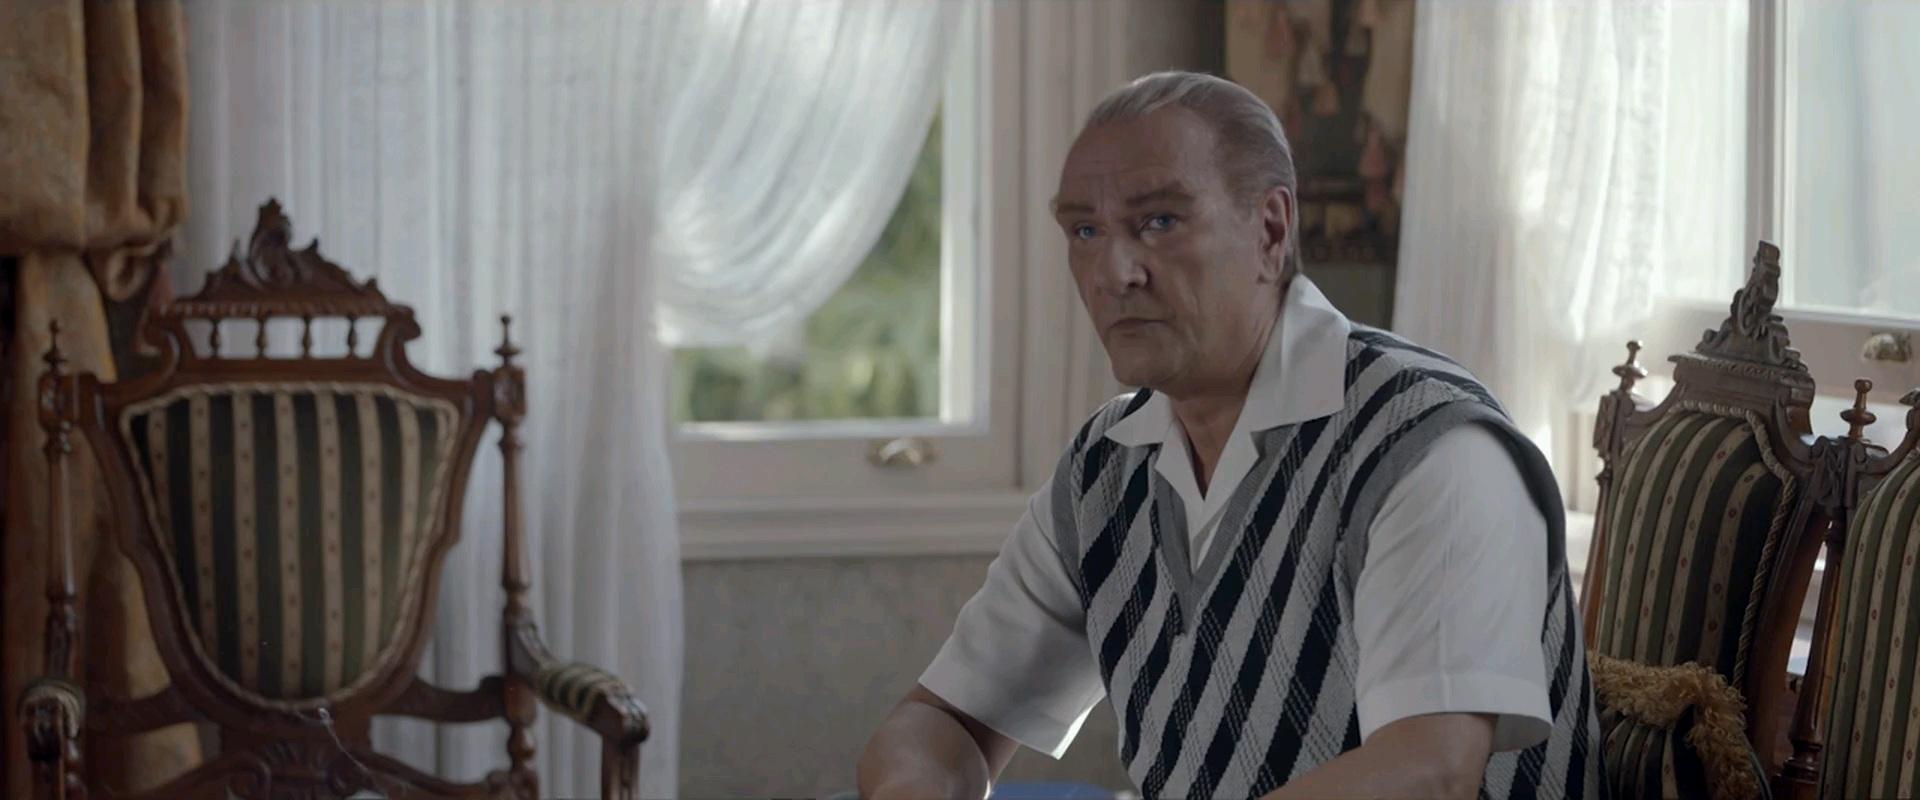 Çiçero | 2019 | Yerli Film | NF | WEB-DL | XviD | Sansürsüz | 1080p - m720p - m1080p | WEB-DL | Tek Link